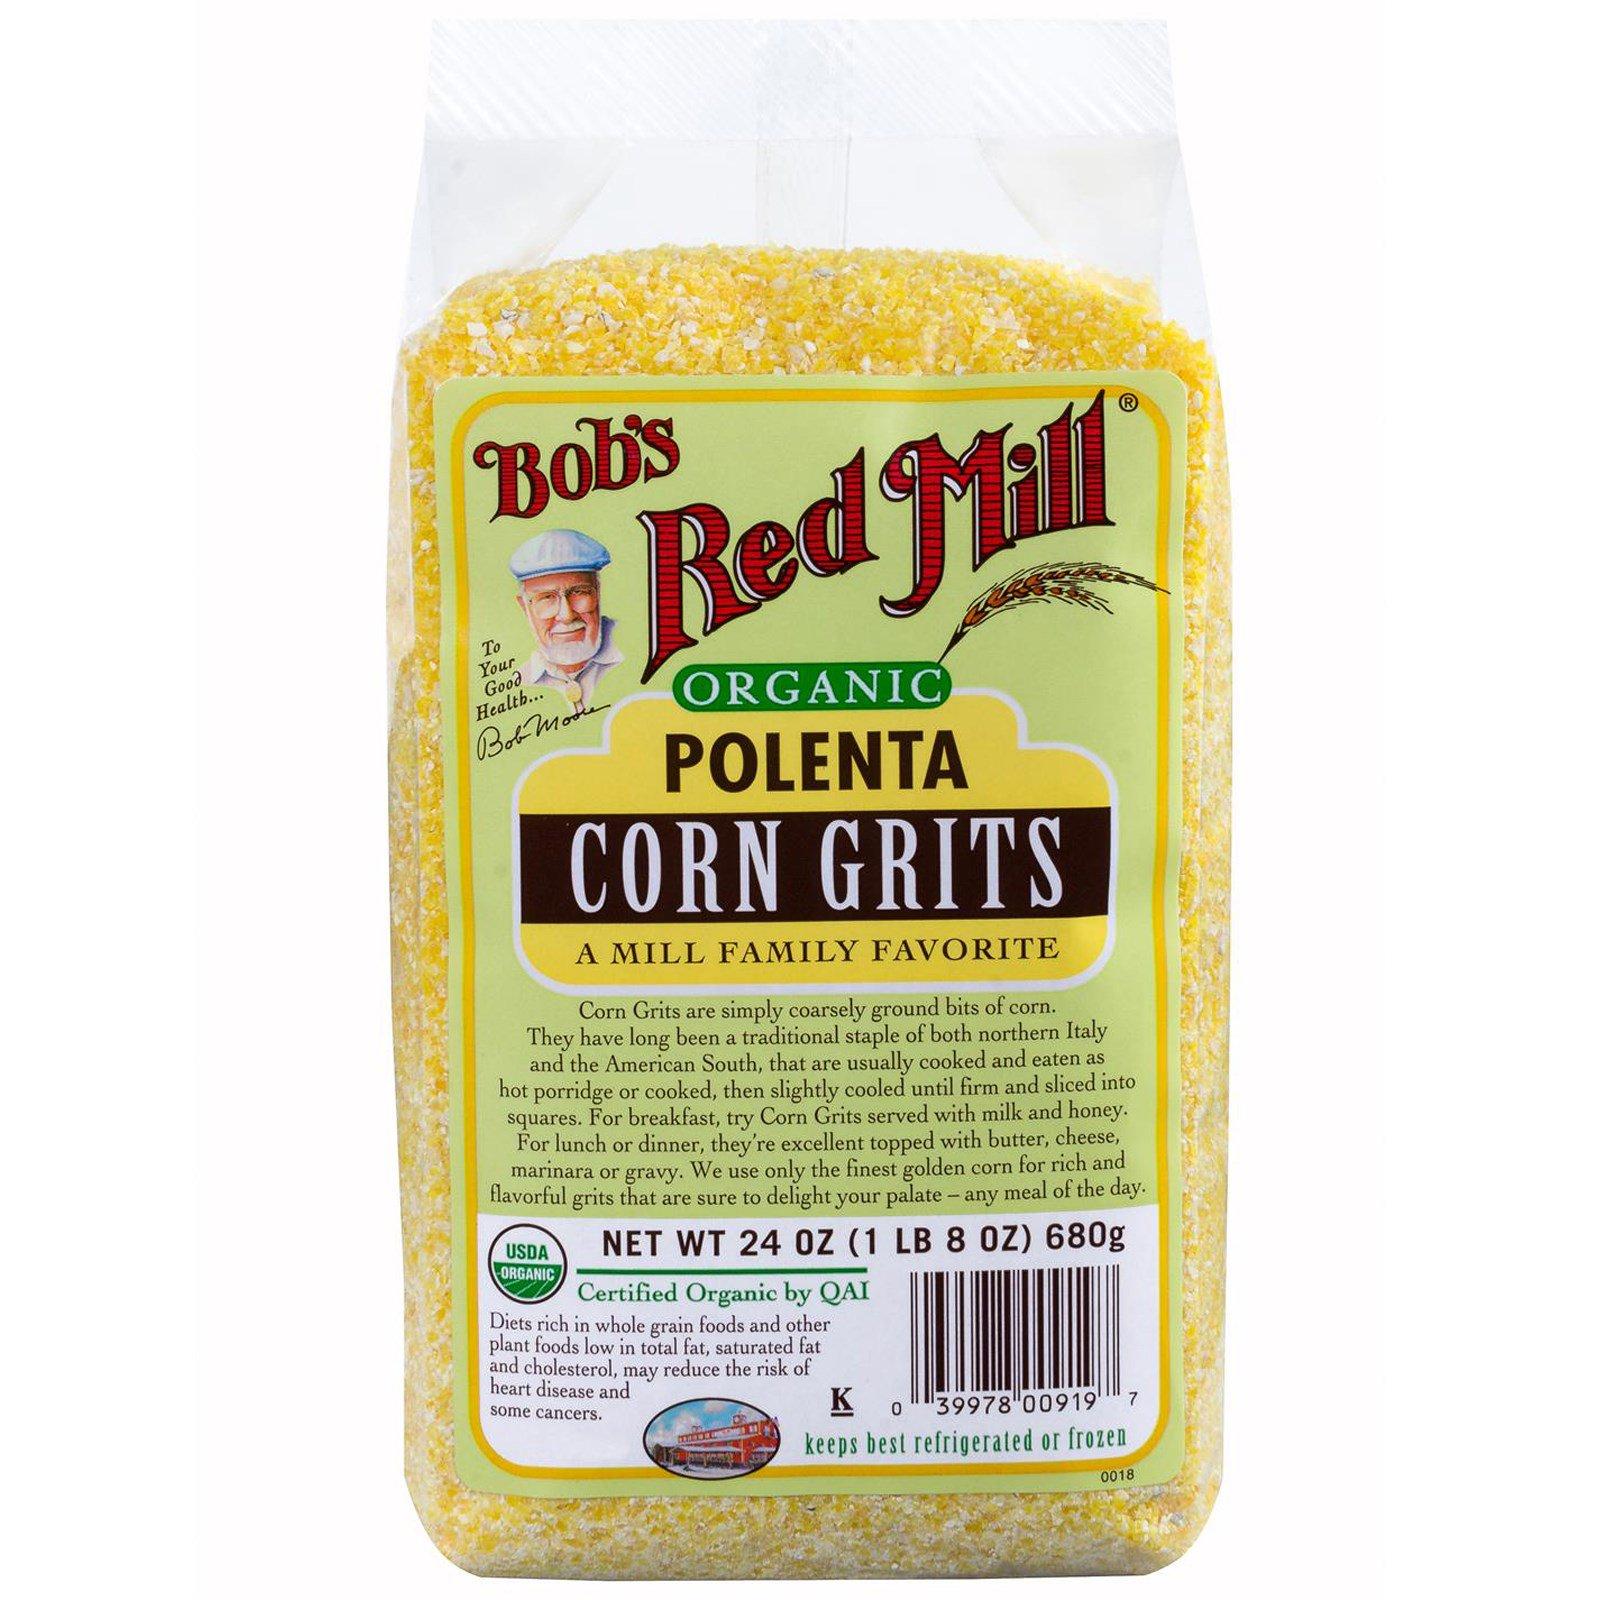 Bob's Red Mill, Organic, полента, кукурузная крупа, 24 унции (680 г)